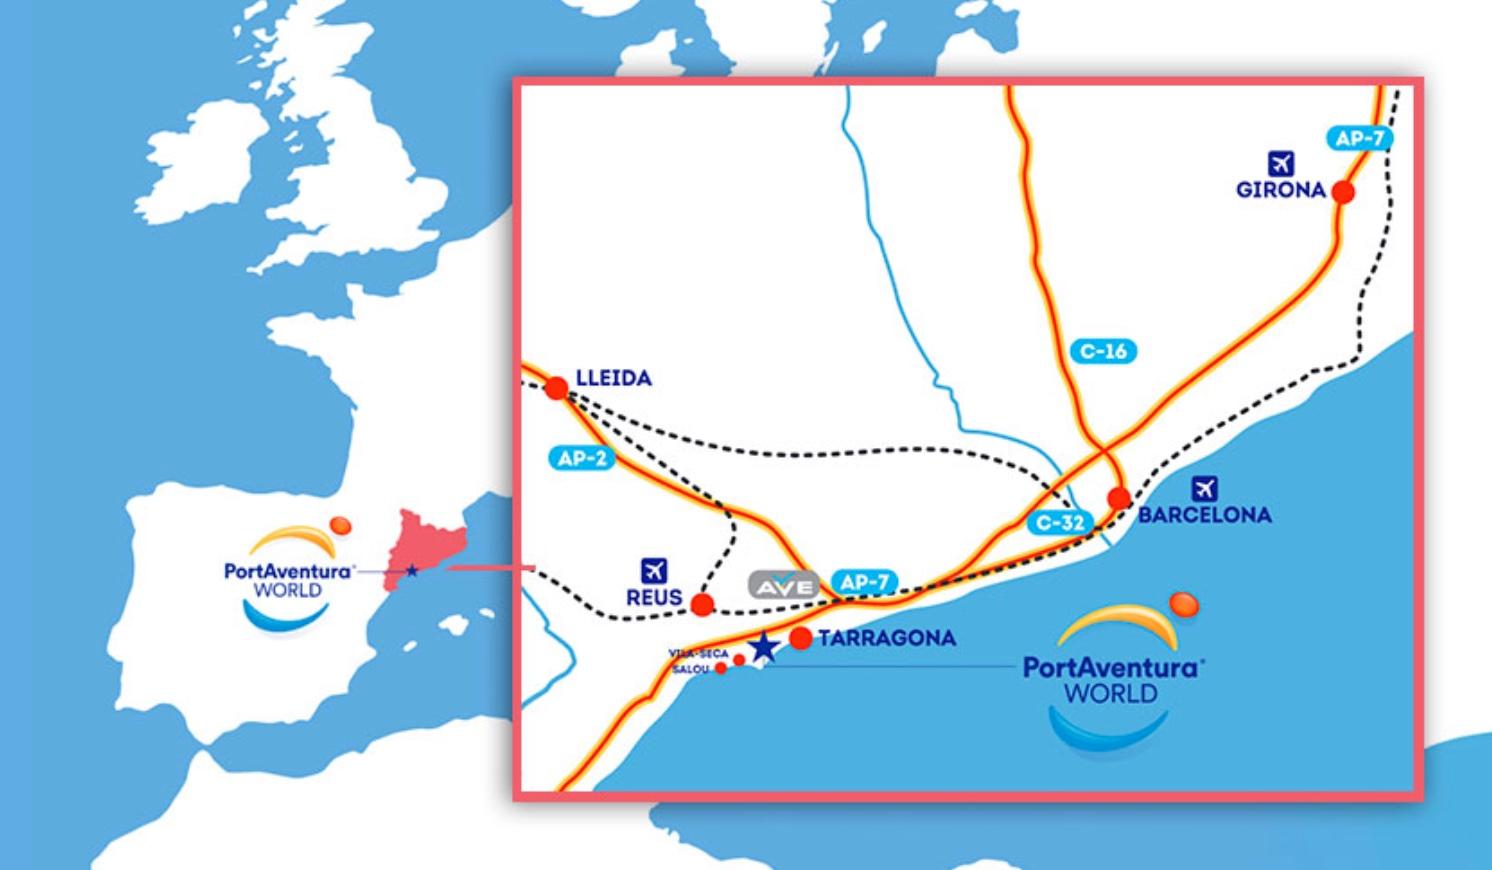 Map of location for PortAventura World